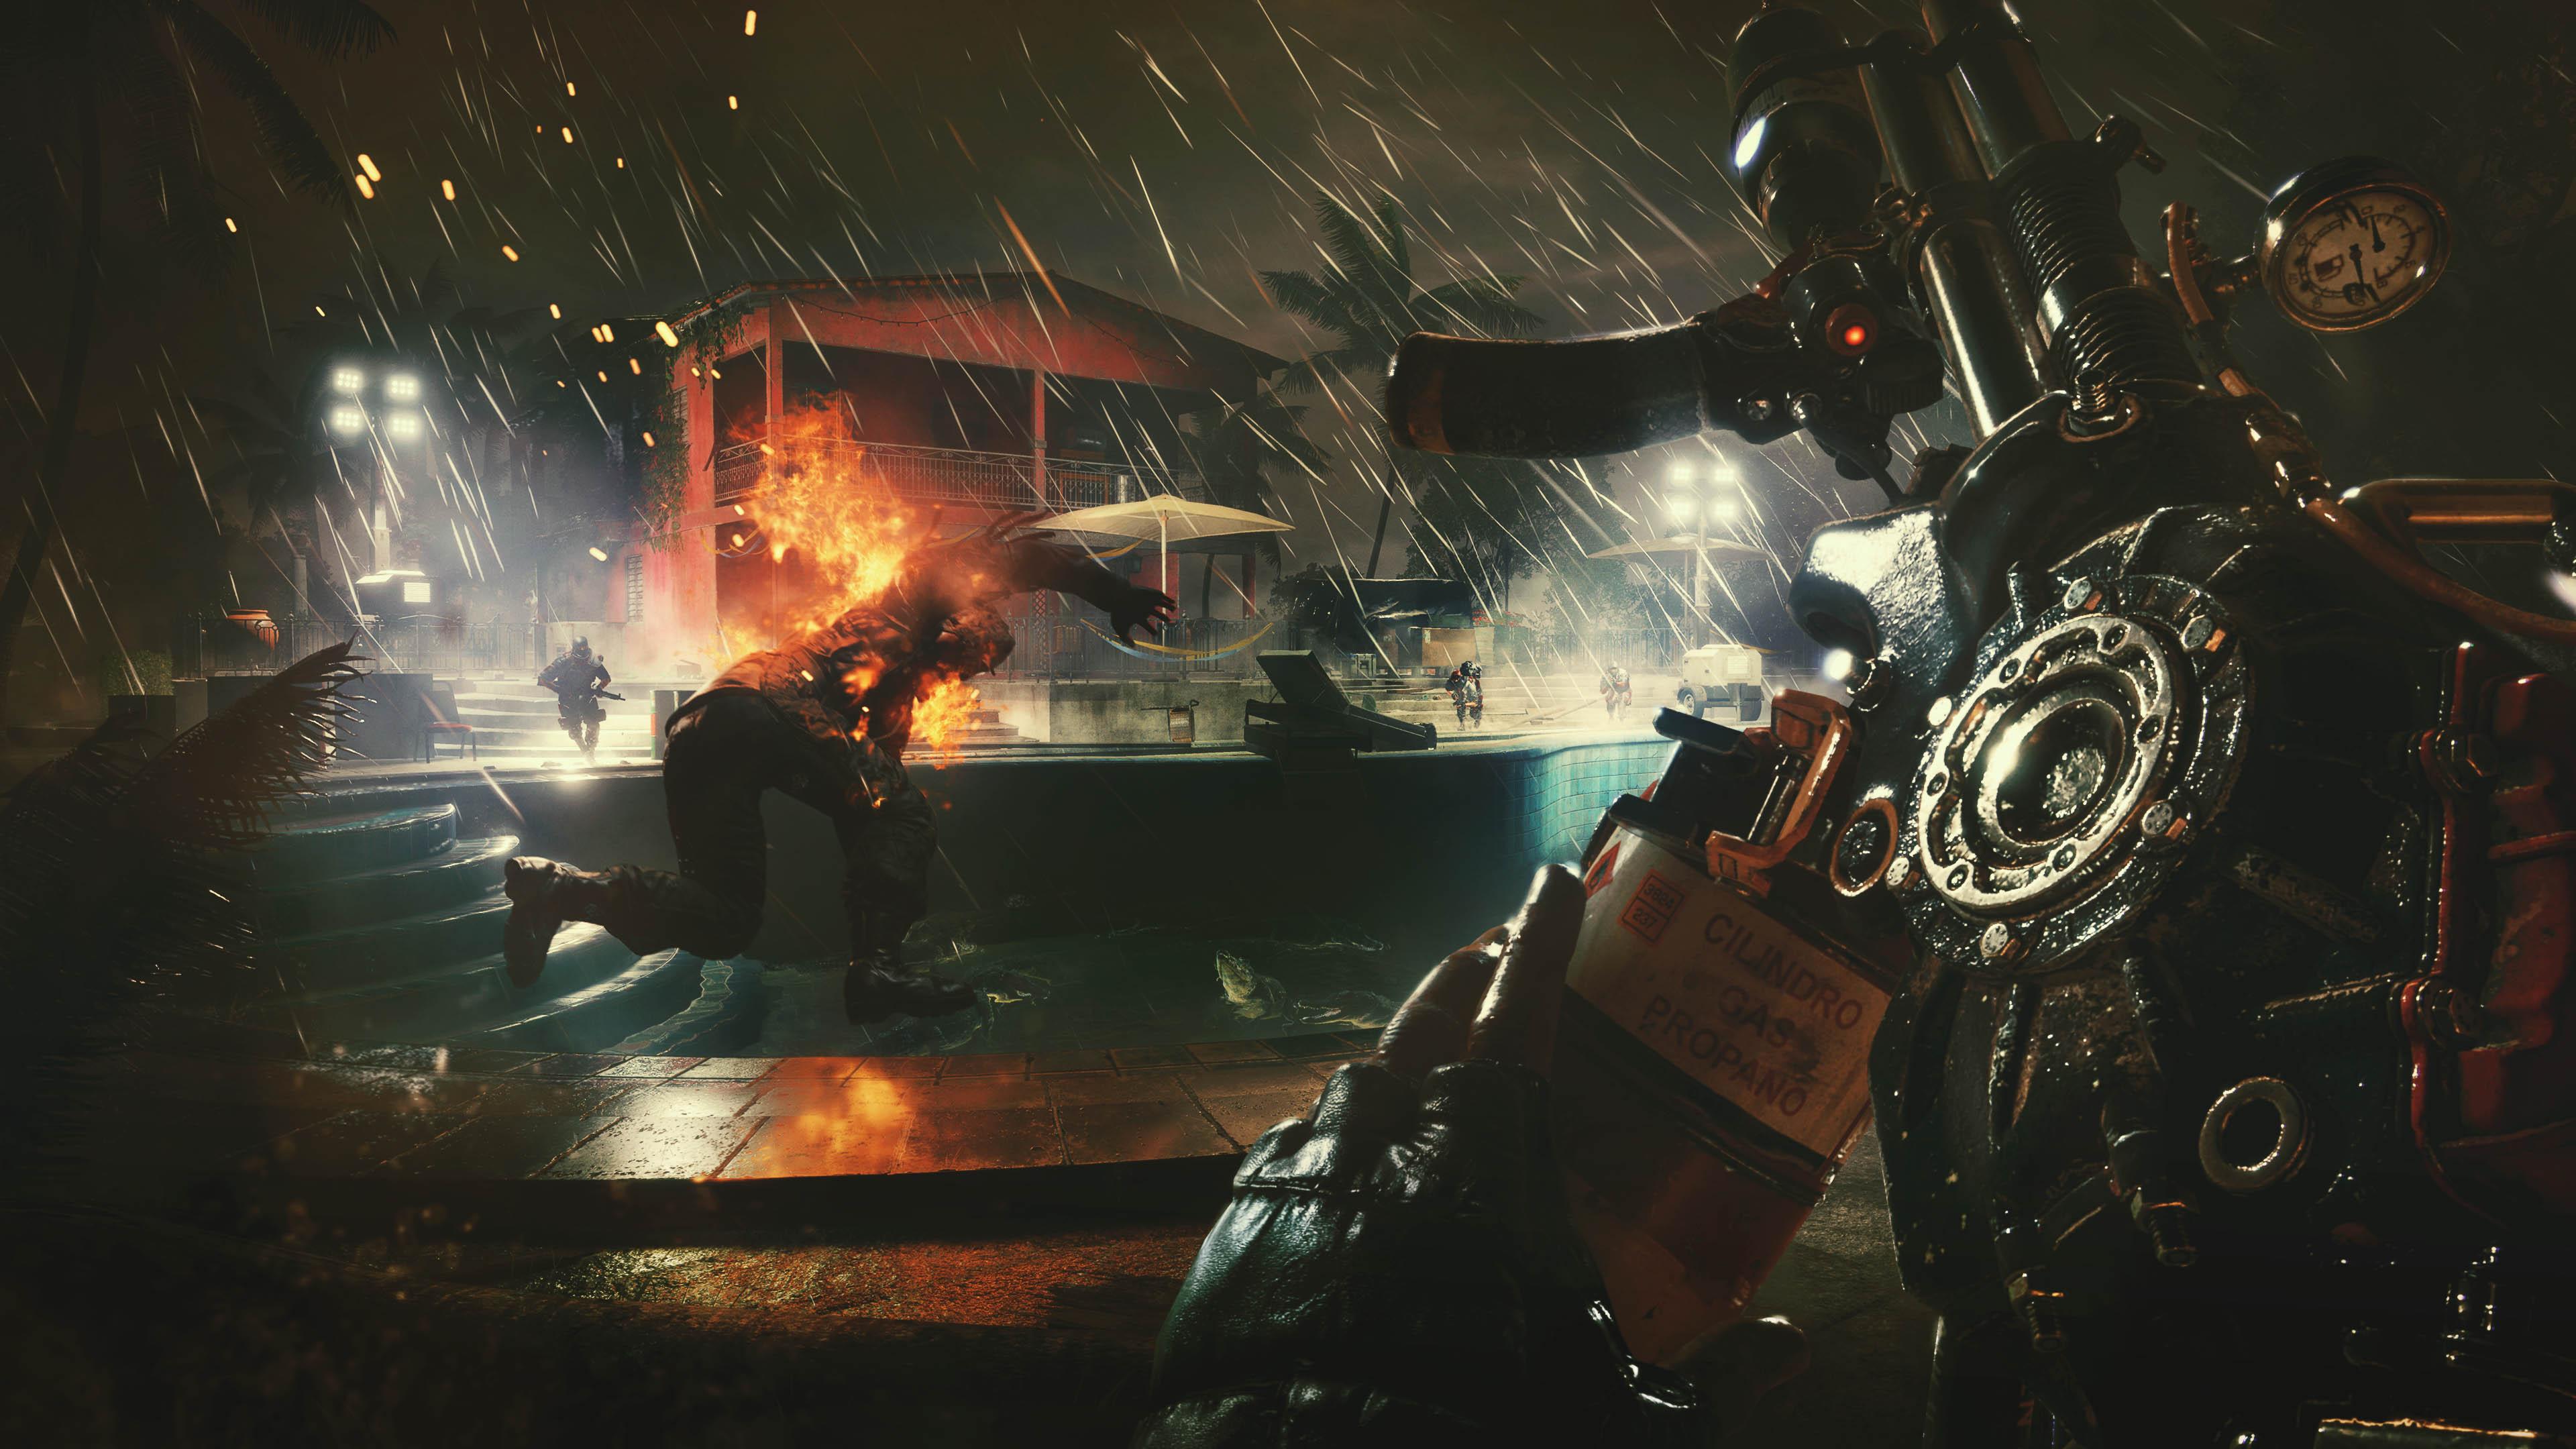 far cry 4 gameplay screenshots